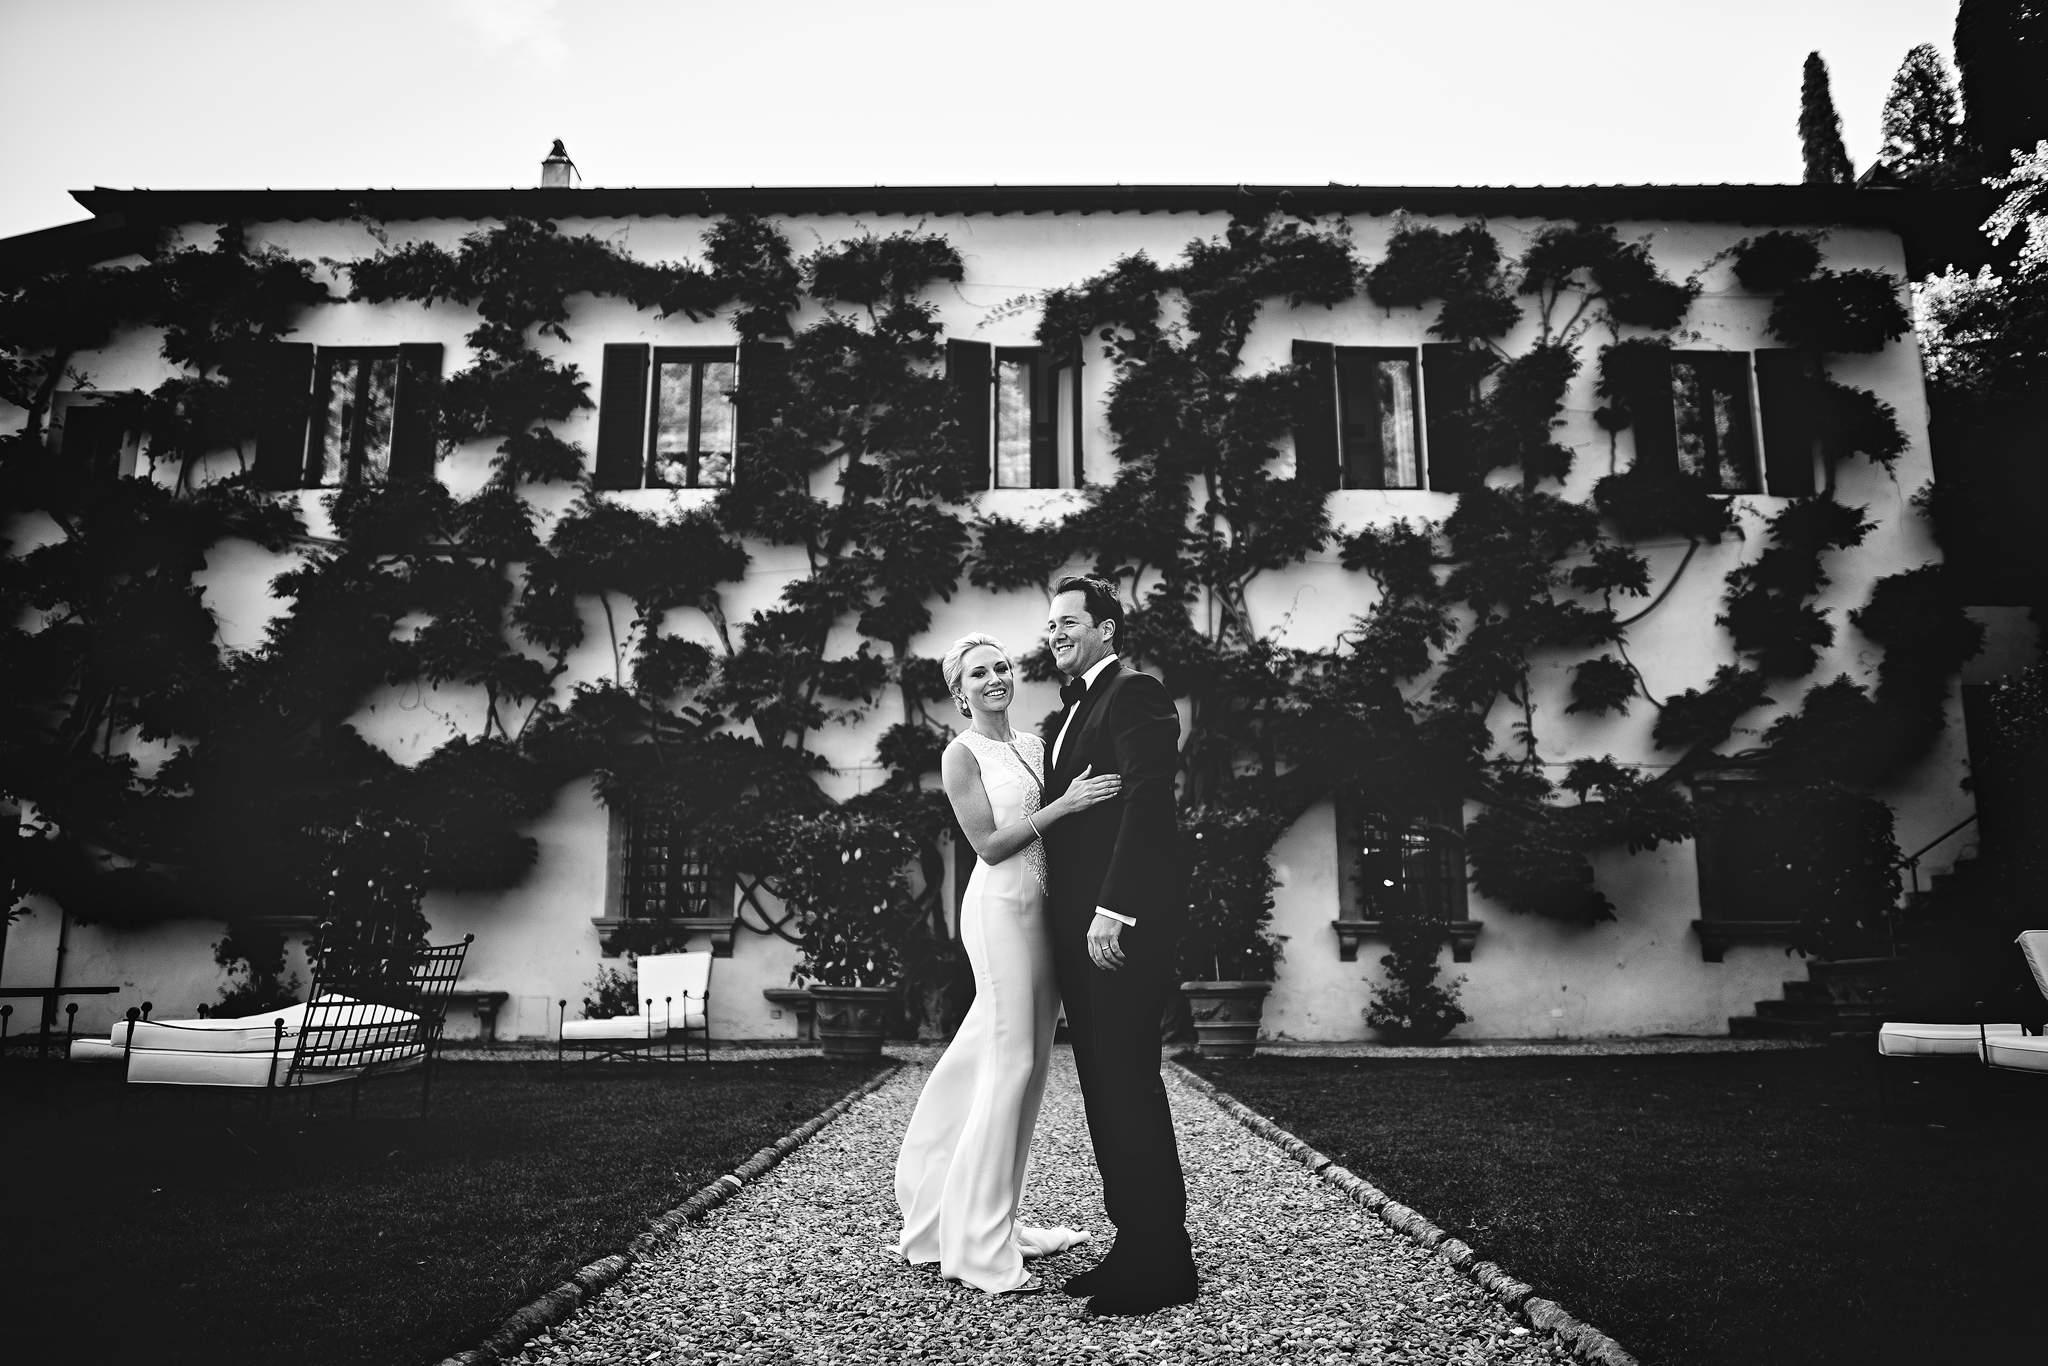 26wedding-photographer-belmond-san-michele-florence